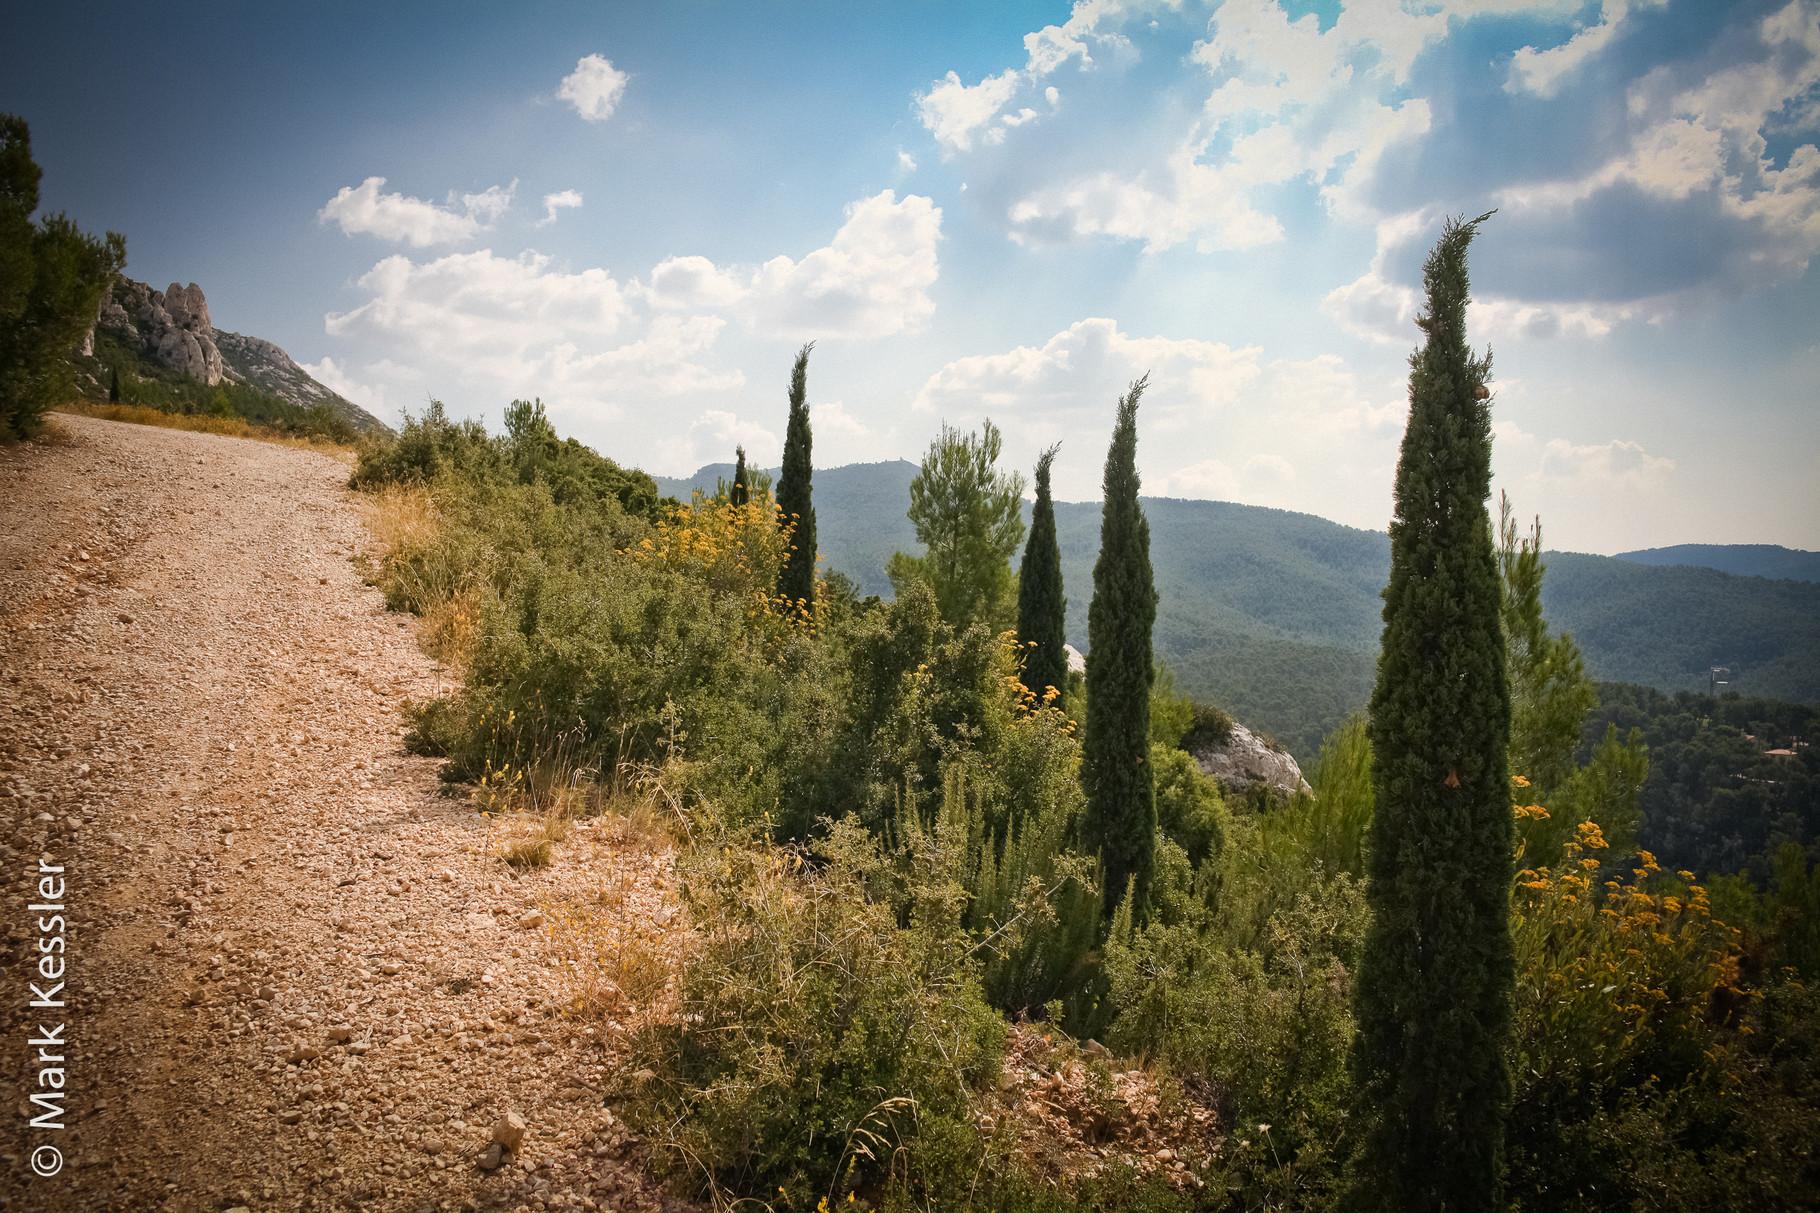 Provence Landschaft Mark Kessler Fotografie in OWL und Niedersachsen